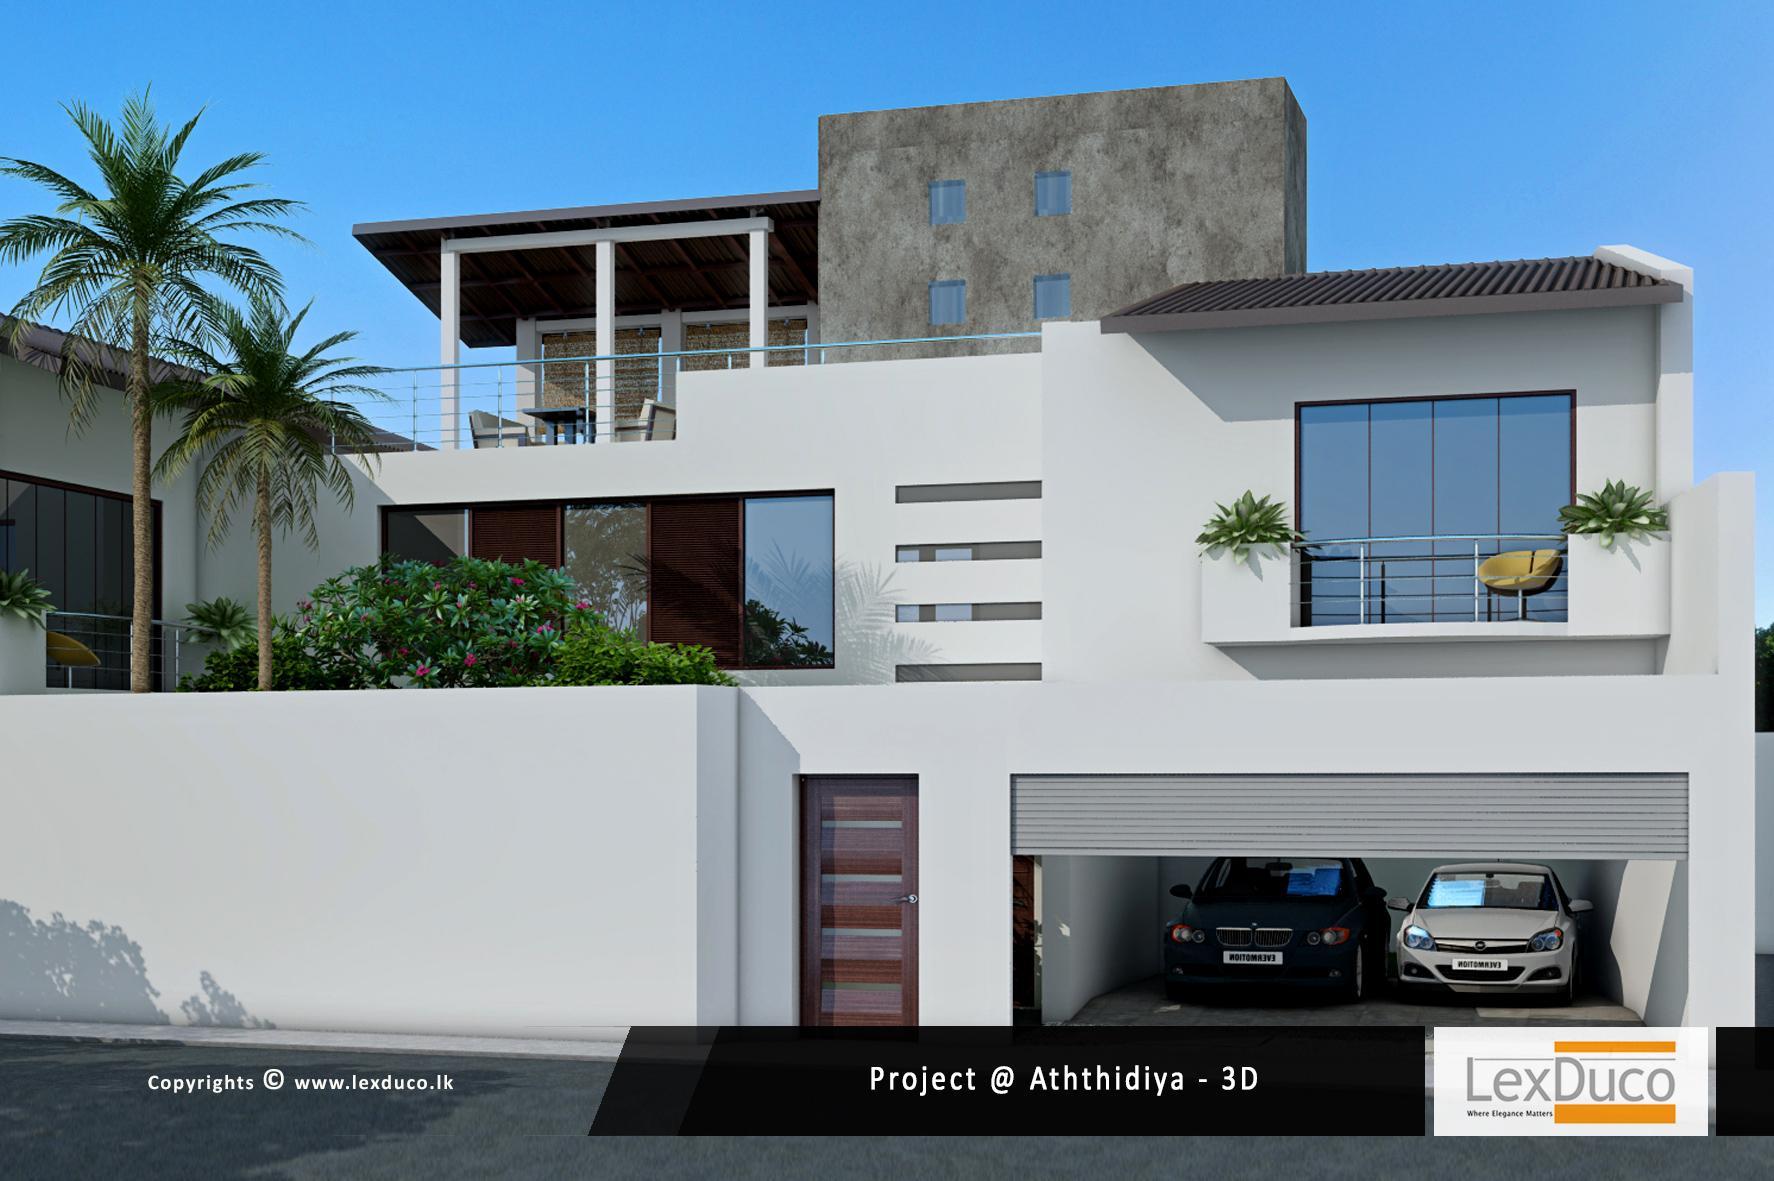 Residential Housing Project at Attidiya | Lex Duco